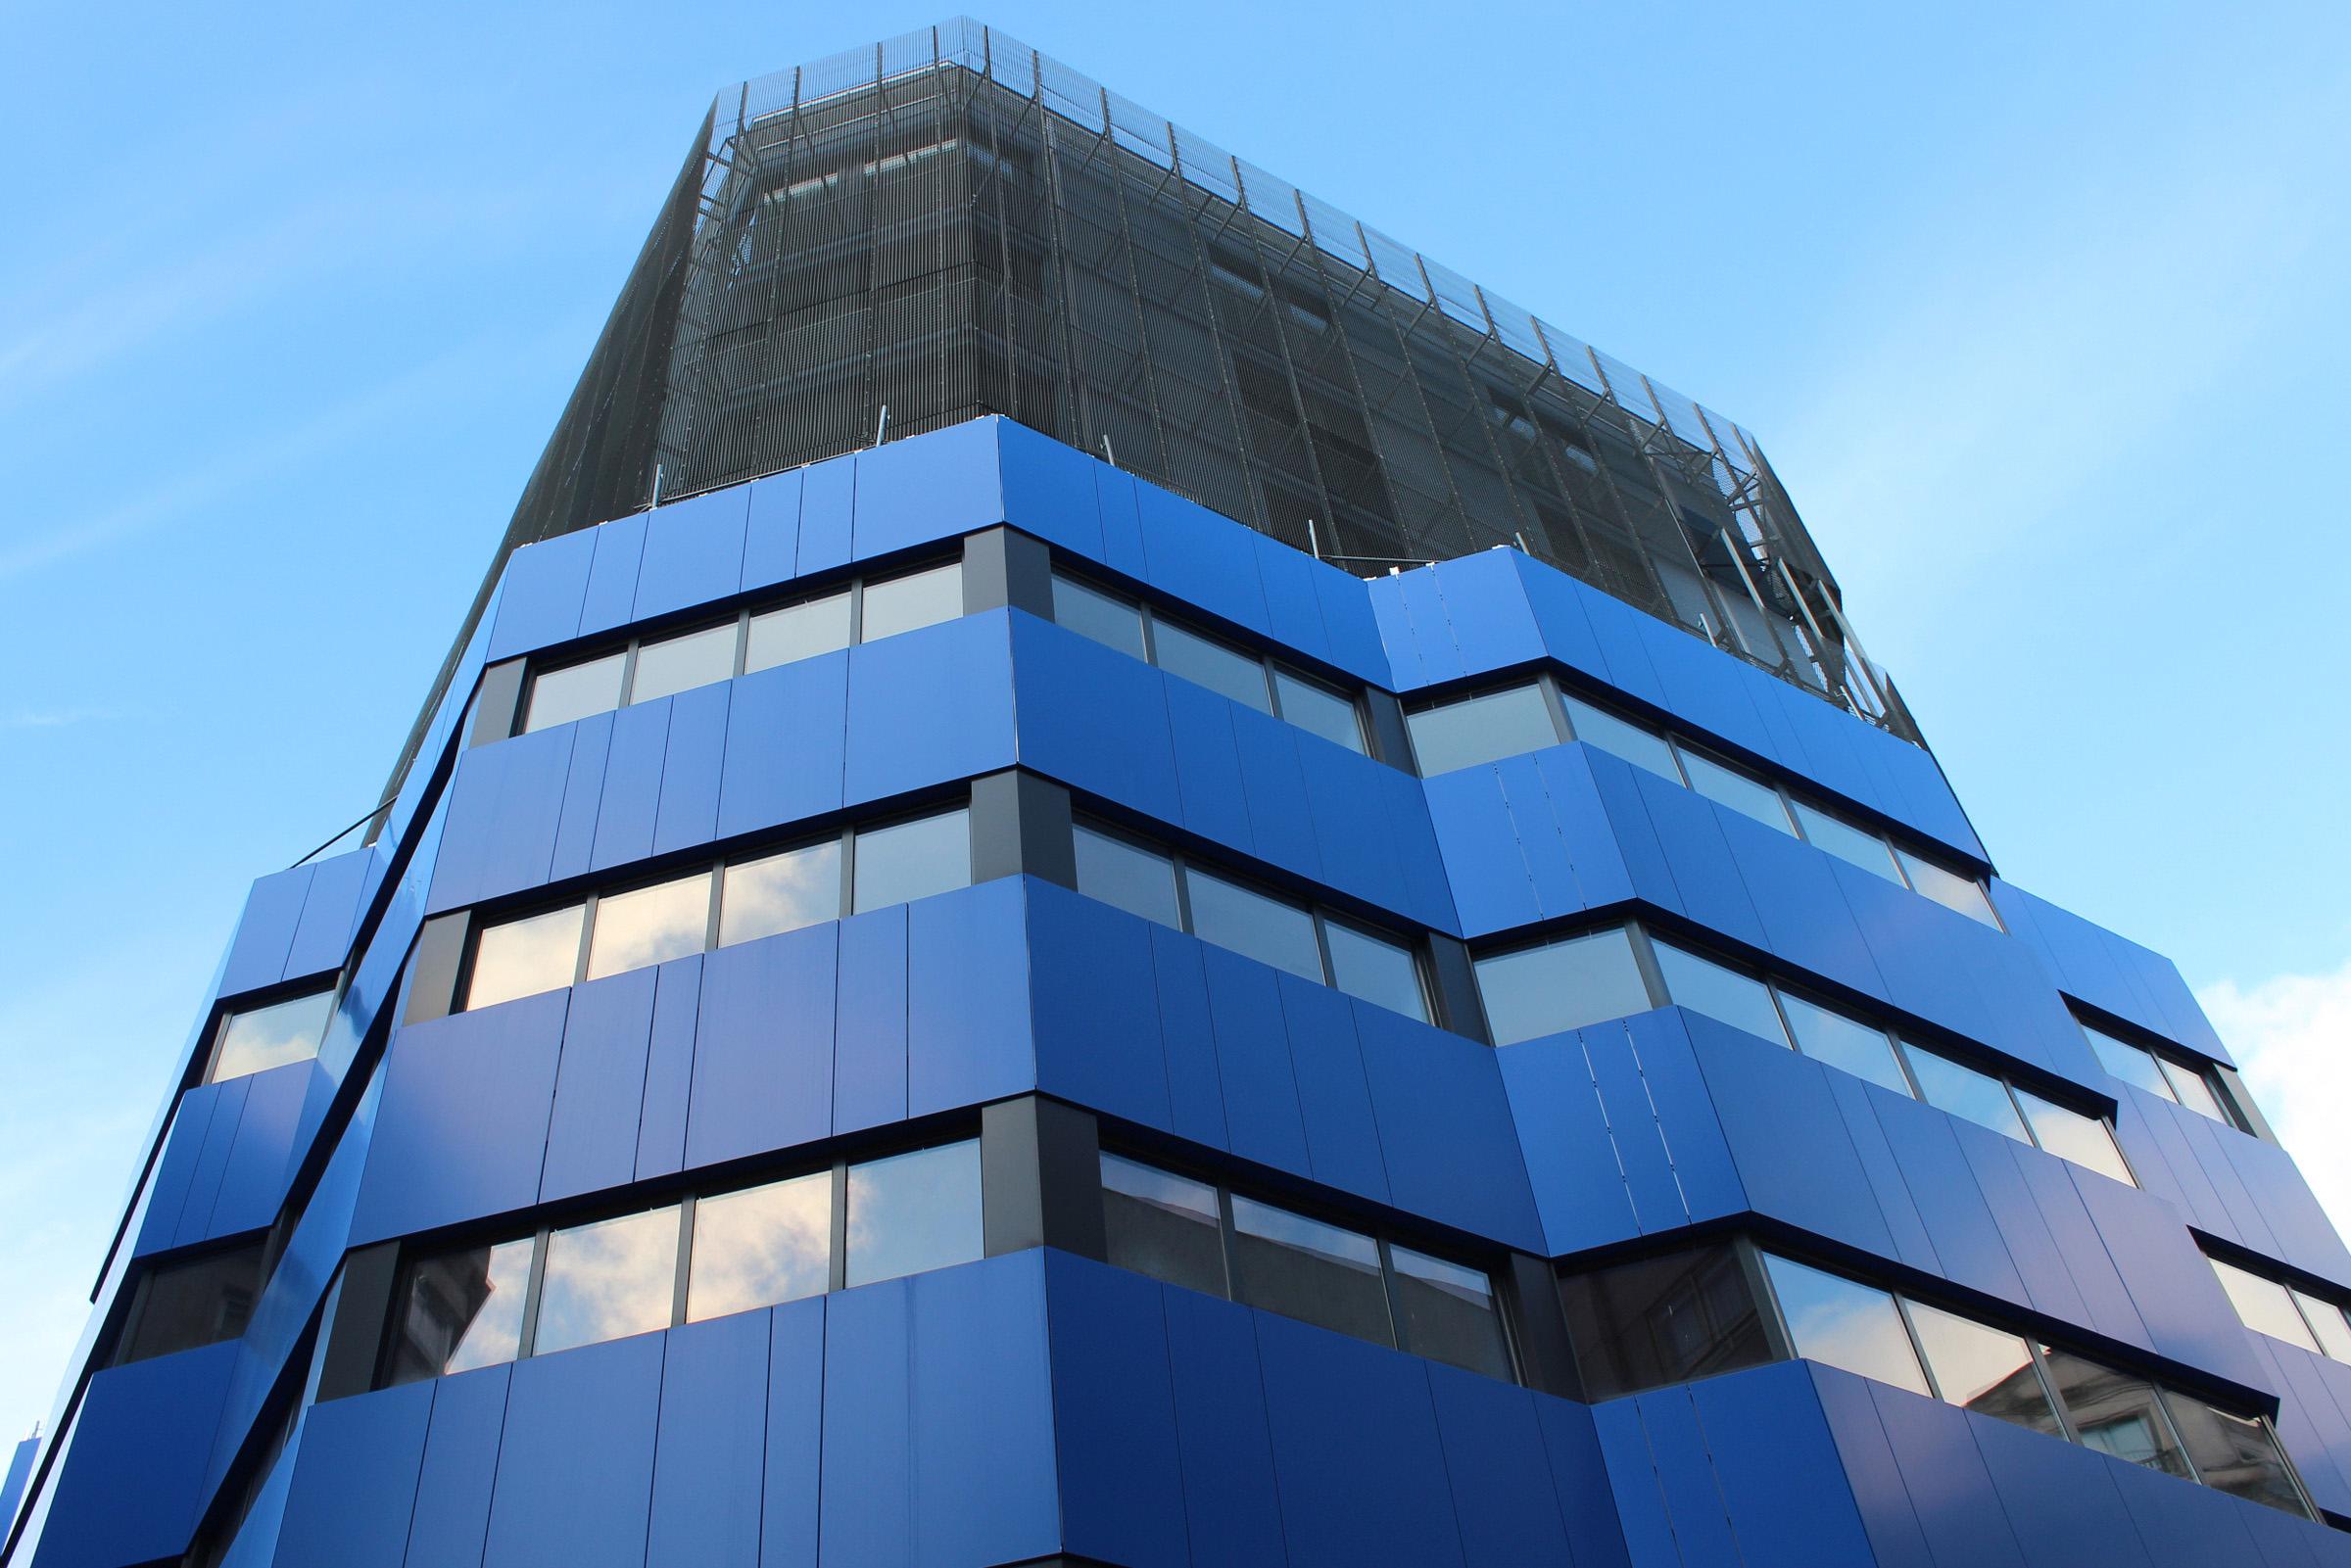 edificio-hacienda-pontevedra-STB-430